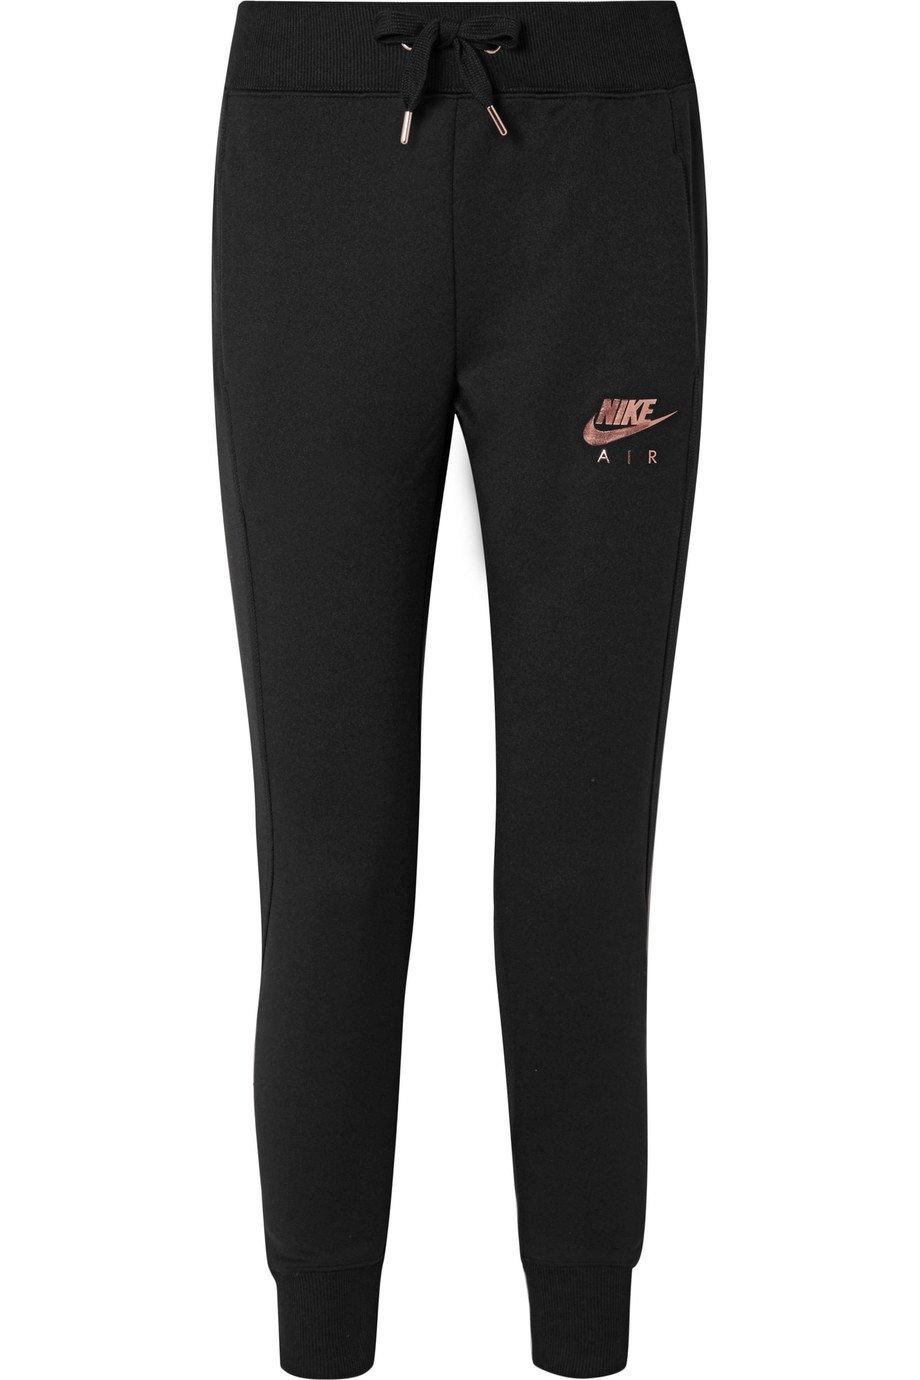 Nike | Air jersey track pants | NET-A-PORTER.COM